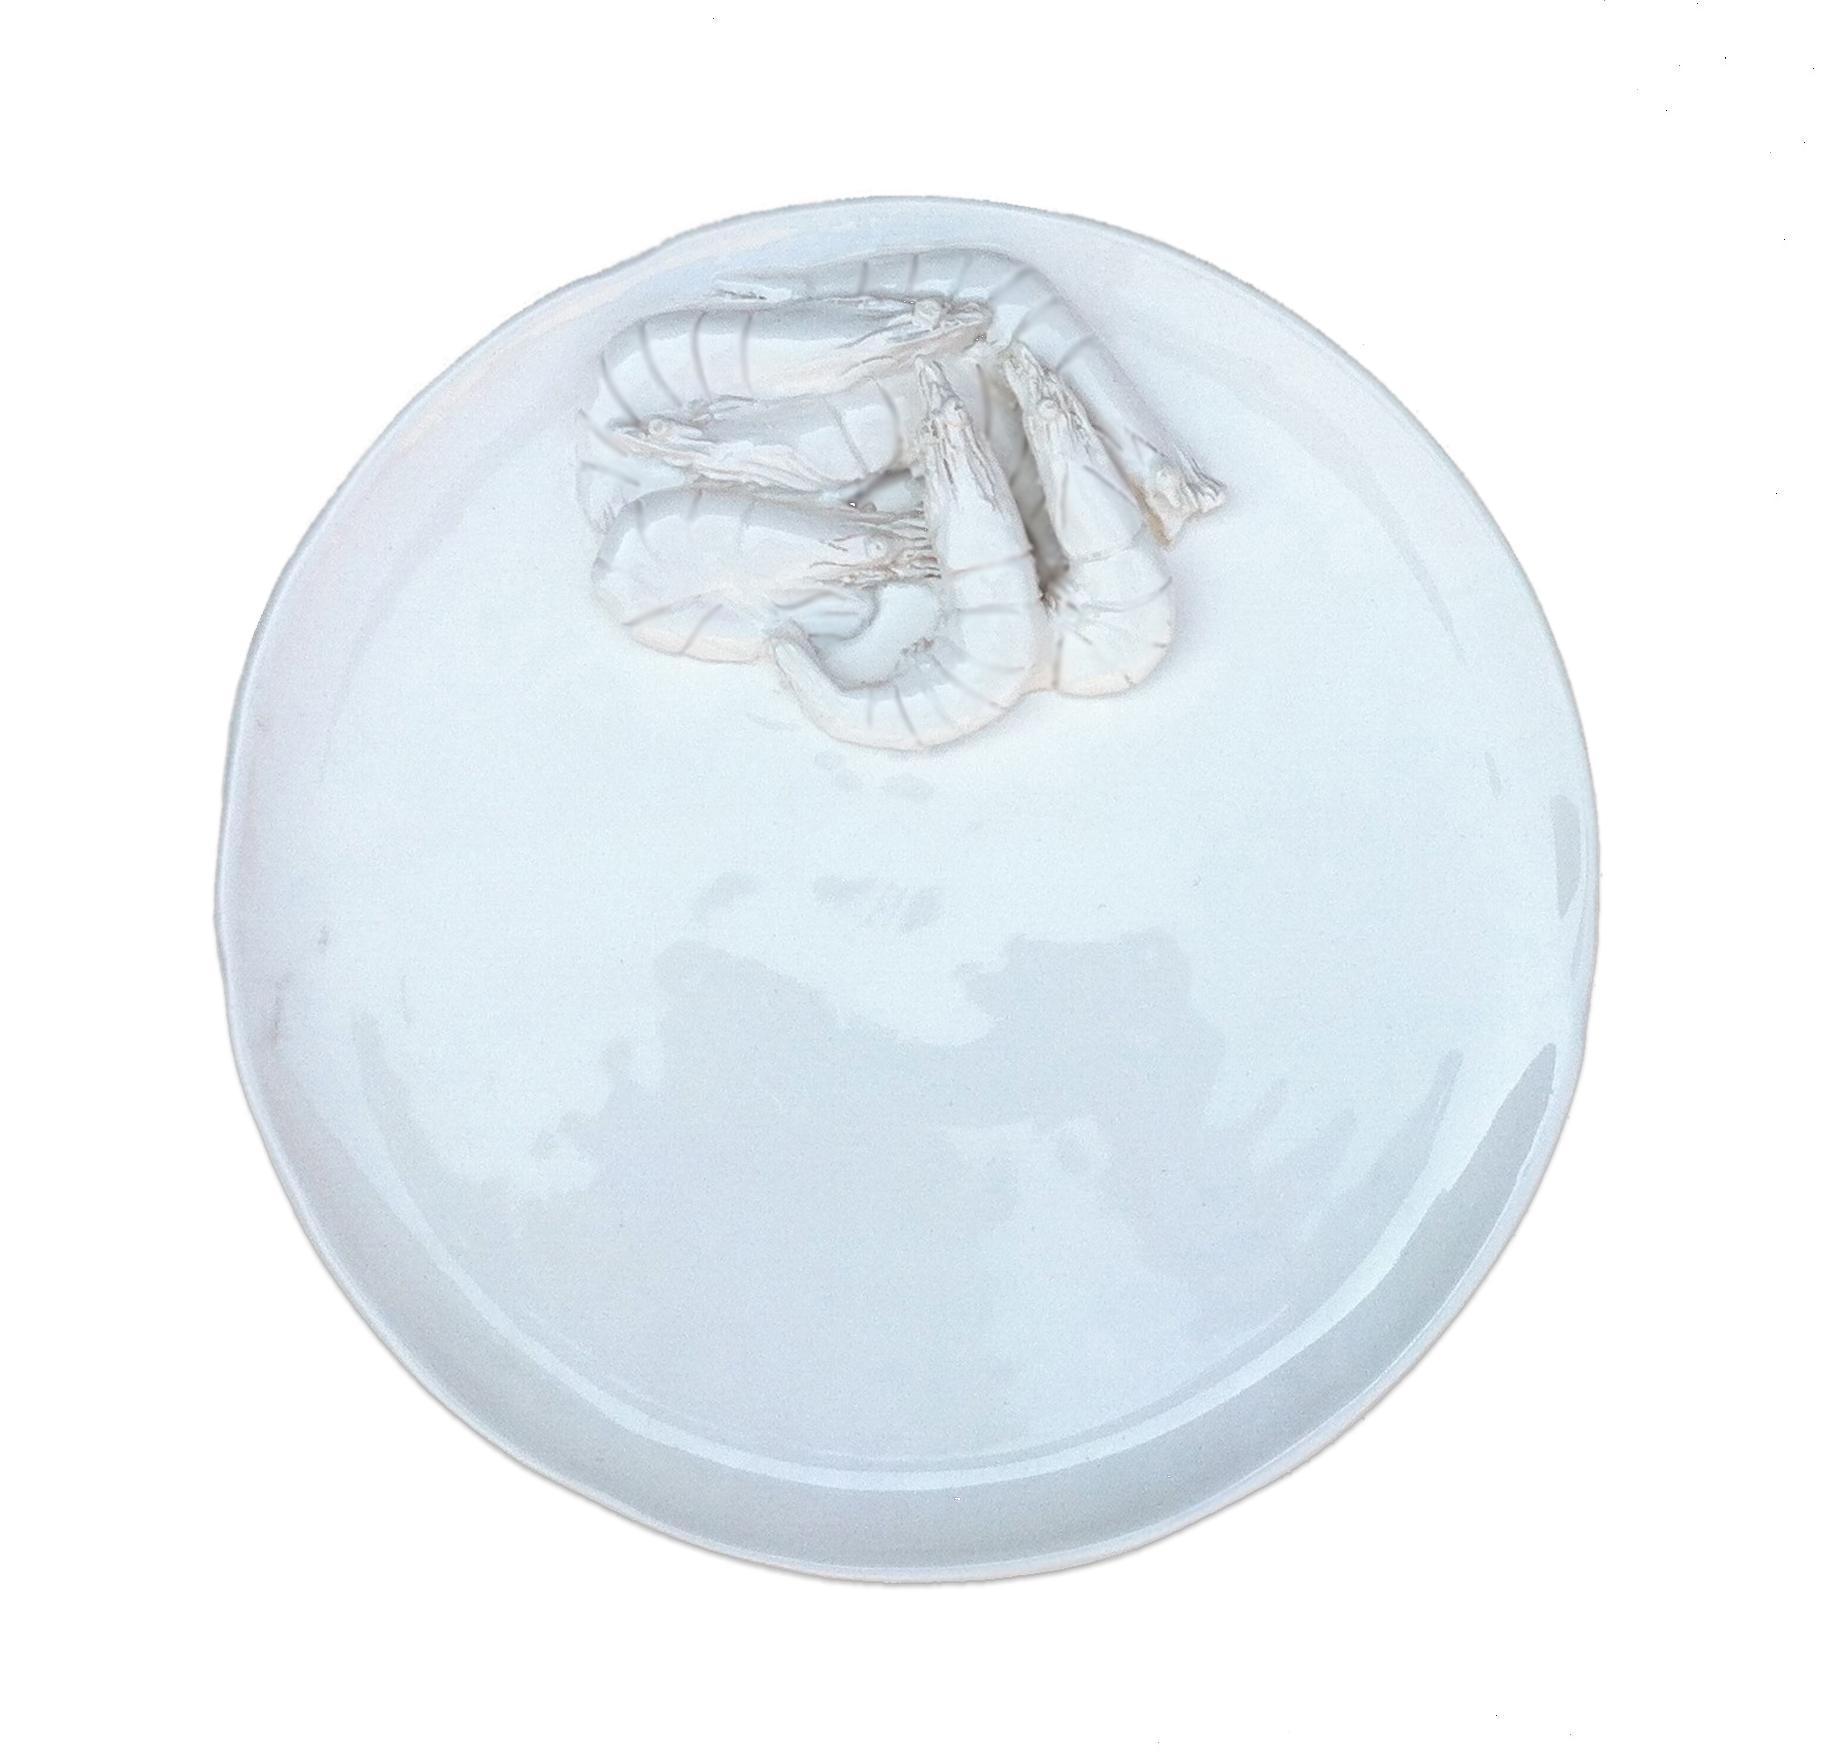 Plate Shrimps - by Annebet Philips .jpg